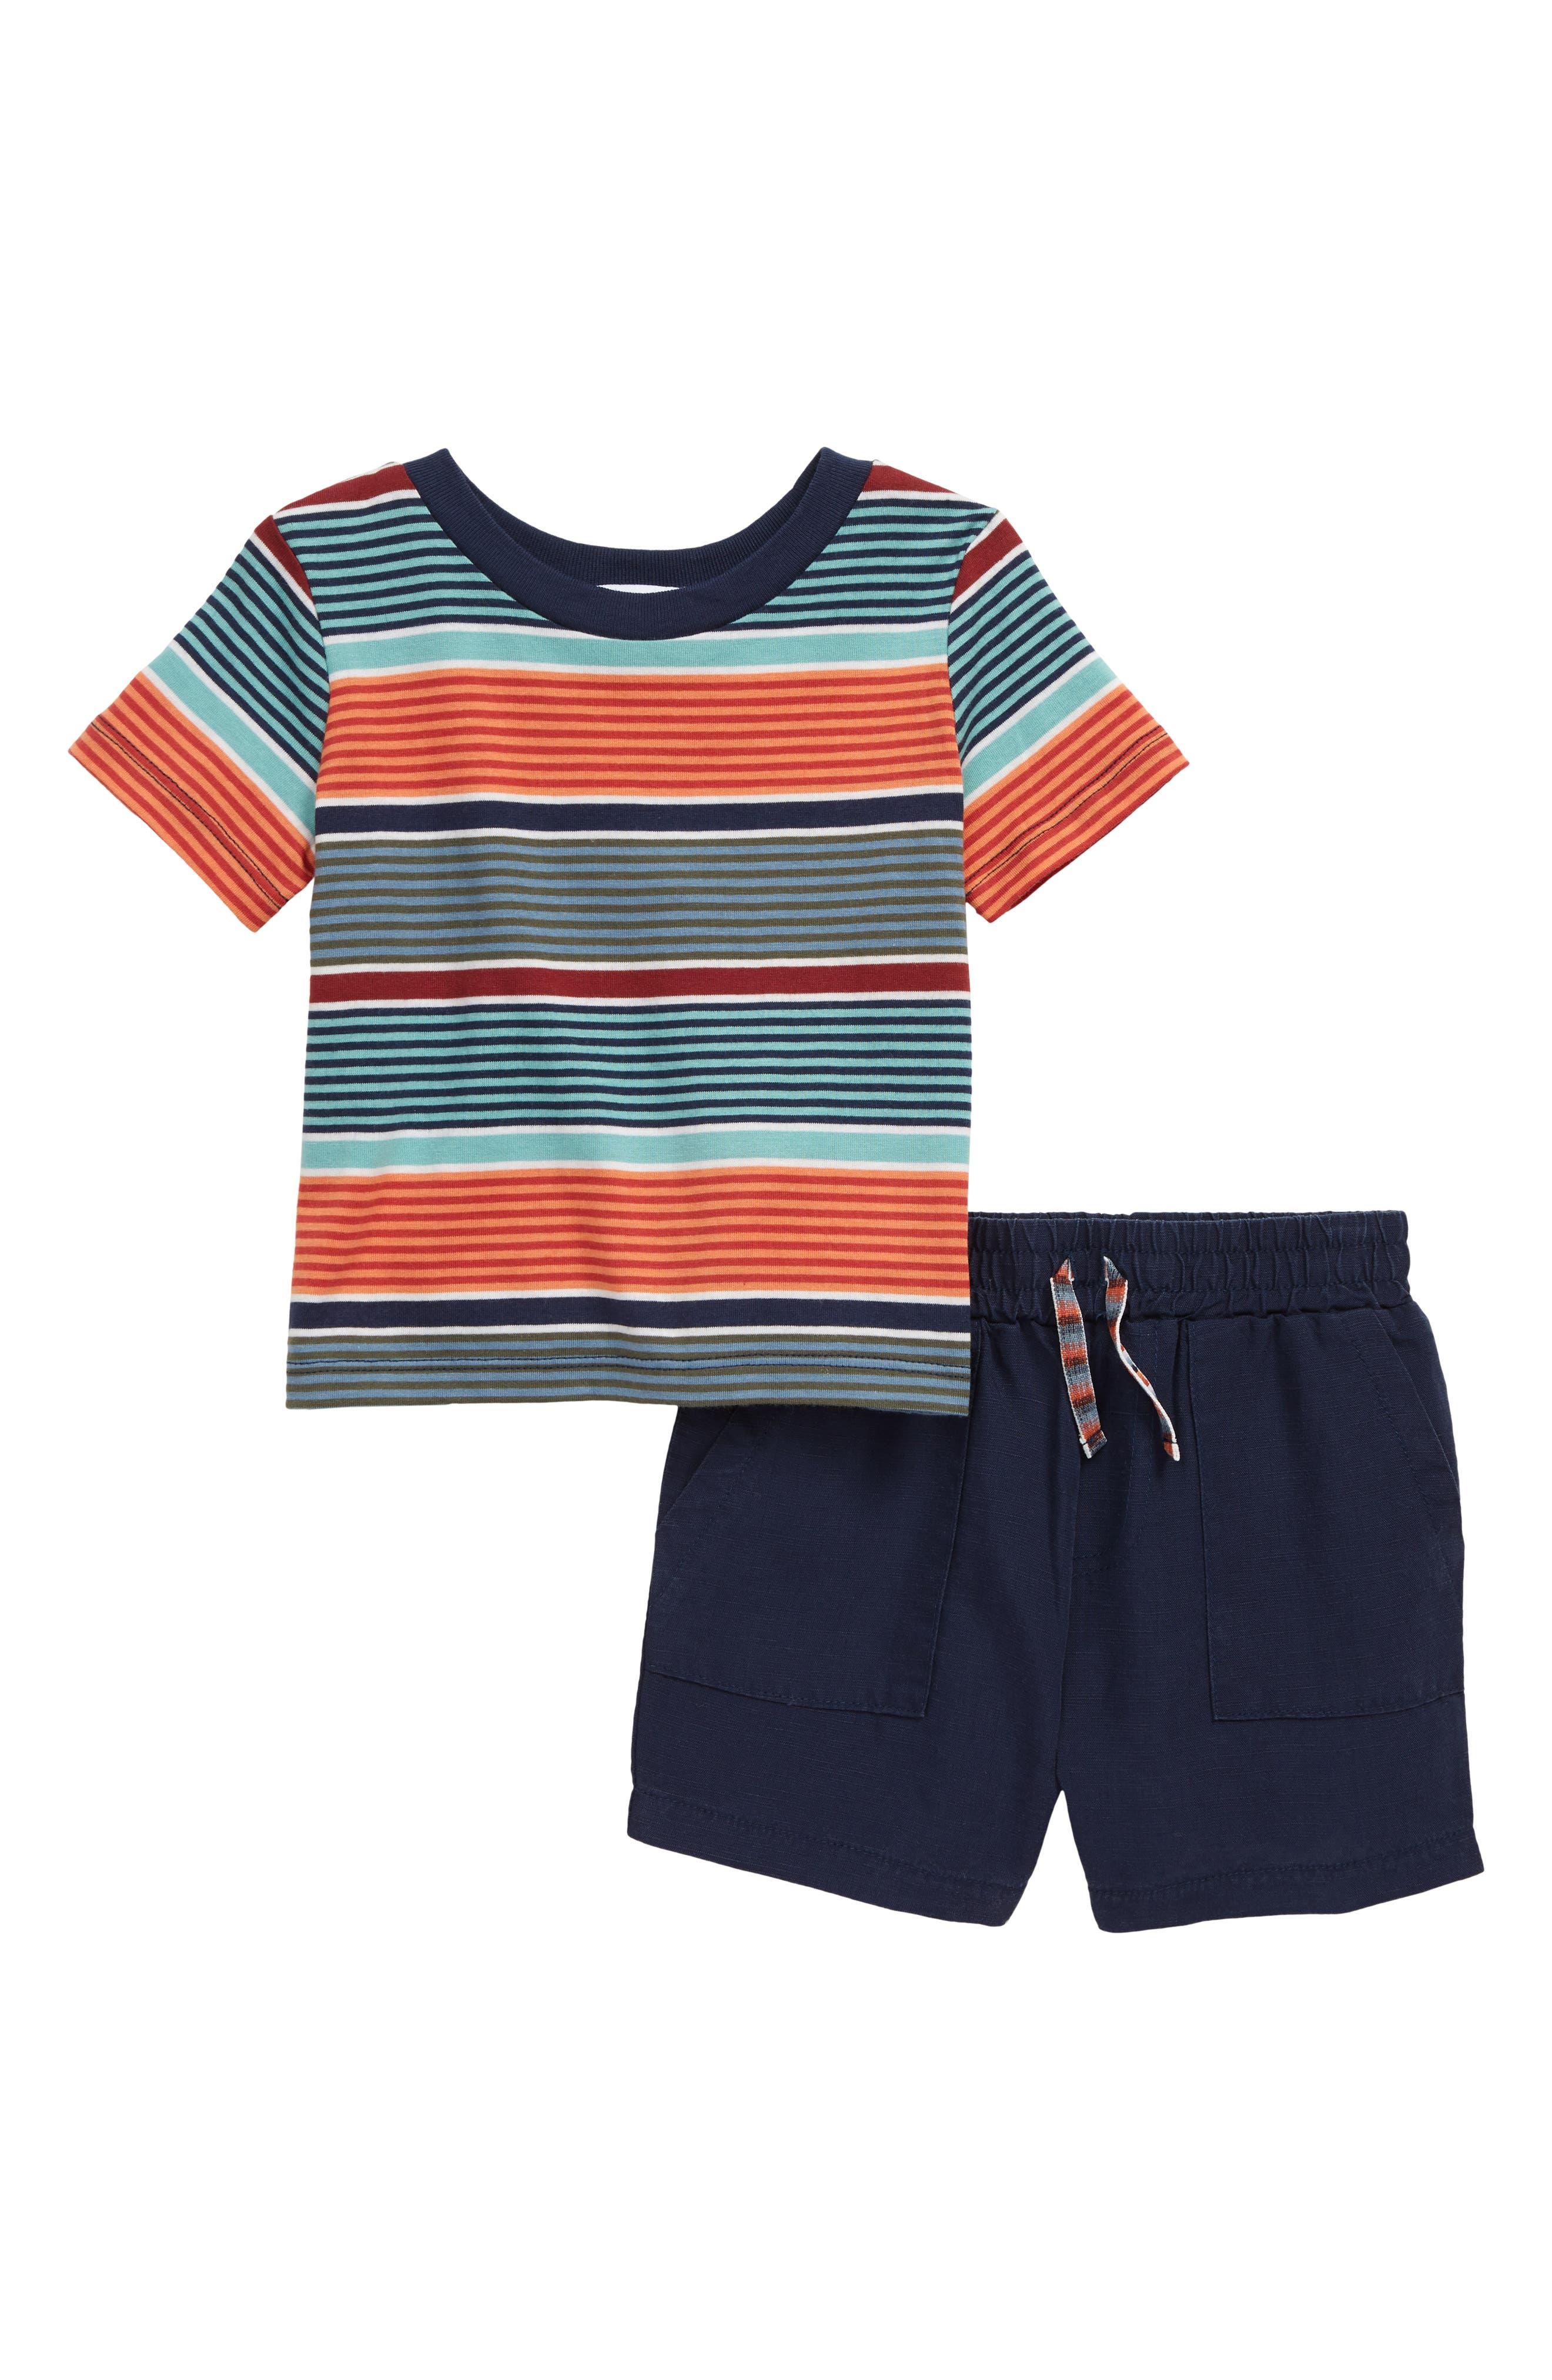 Image of Splendid Stripe T-Shirt & Shorts Set